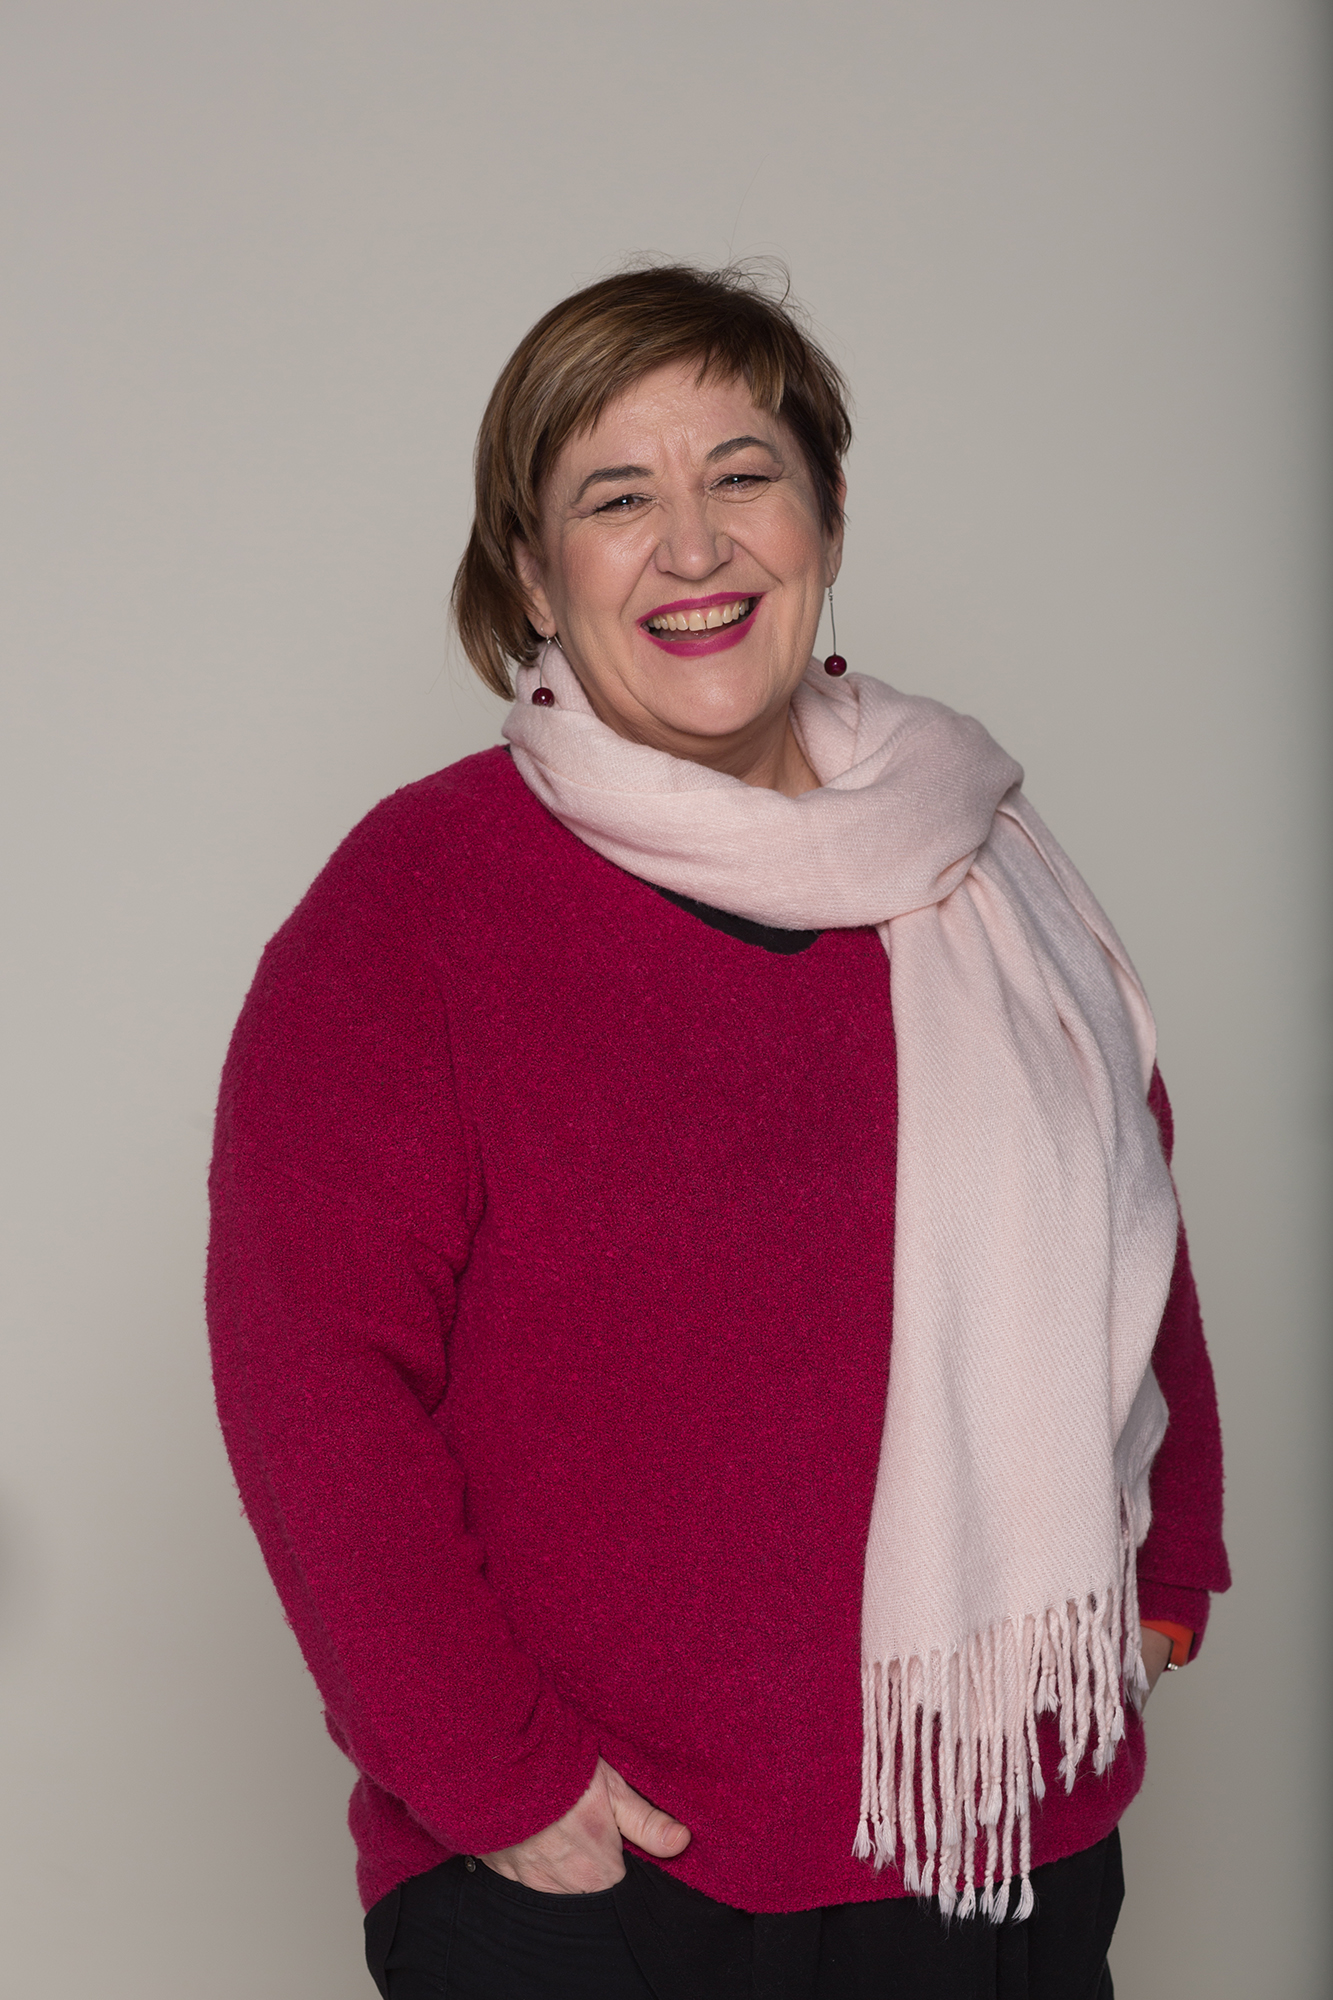 Smiljana Grujic, coordinator of the Support, Not Perfection programme